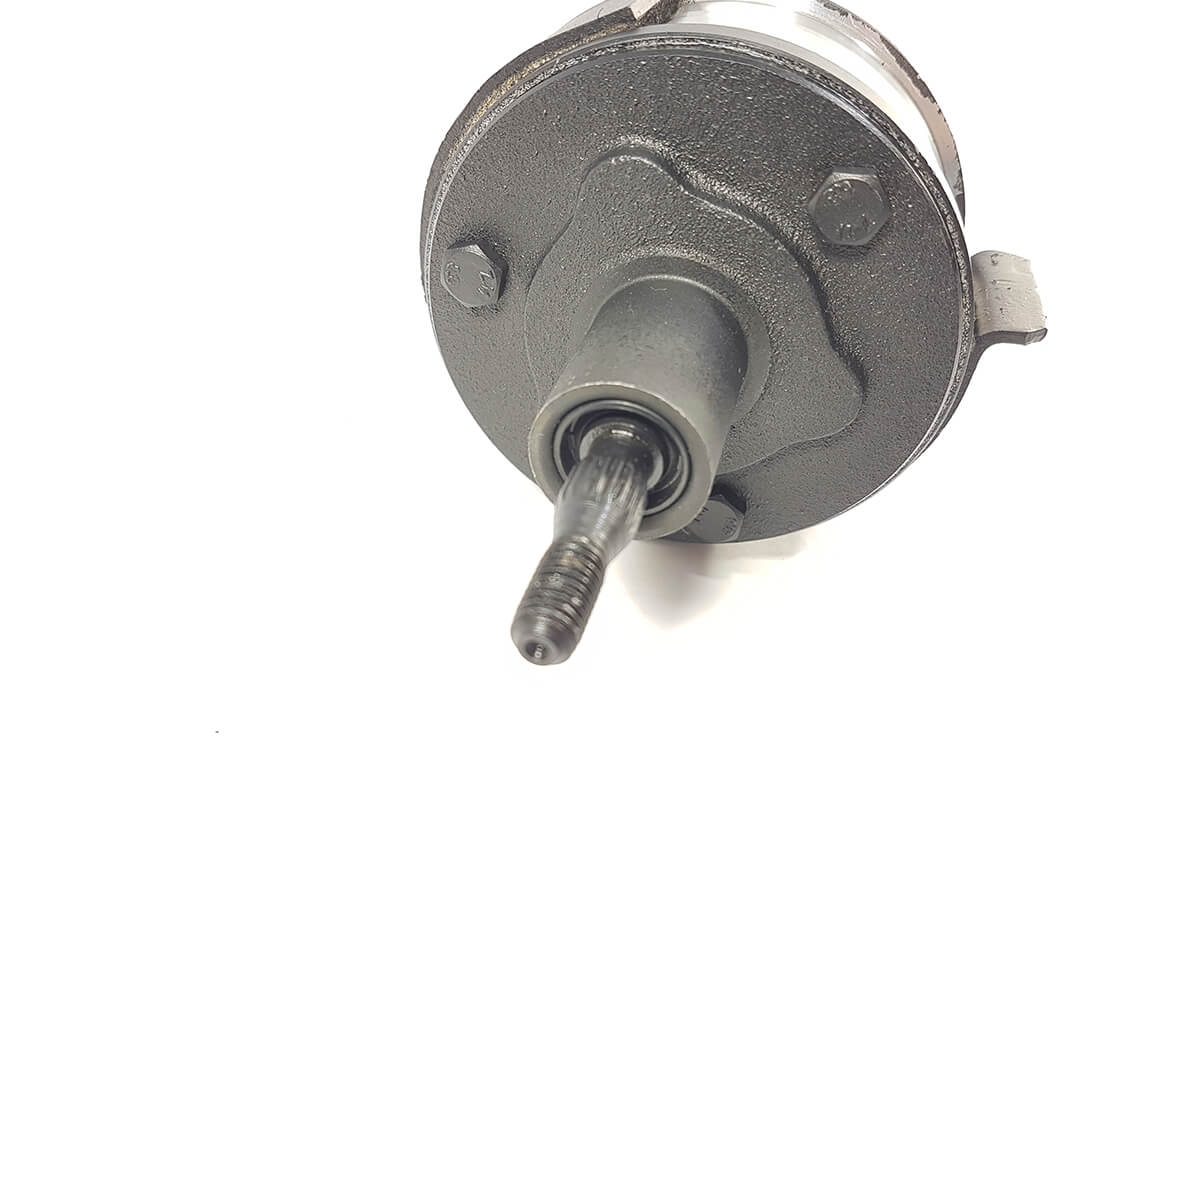 Mecanismo Alado Para Lavadora De Roupas Electrolux Lm08 Lt10 Lf90 Ltr12 Lte12 Lt12 Eixo Longo